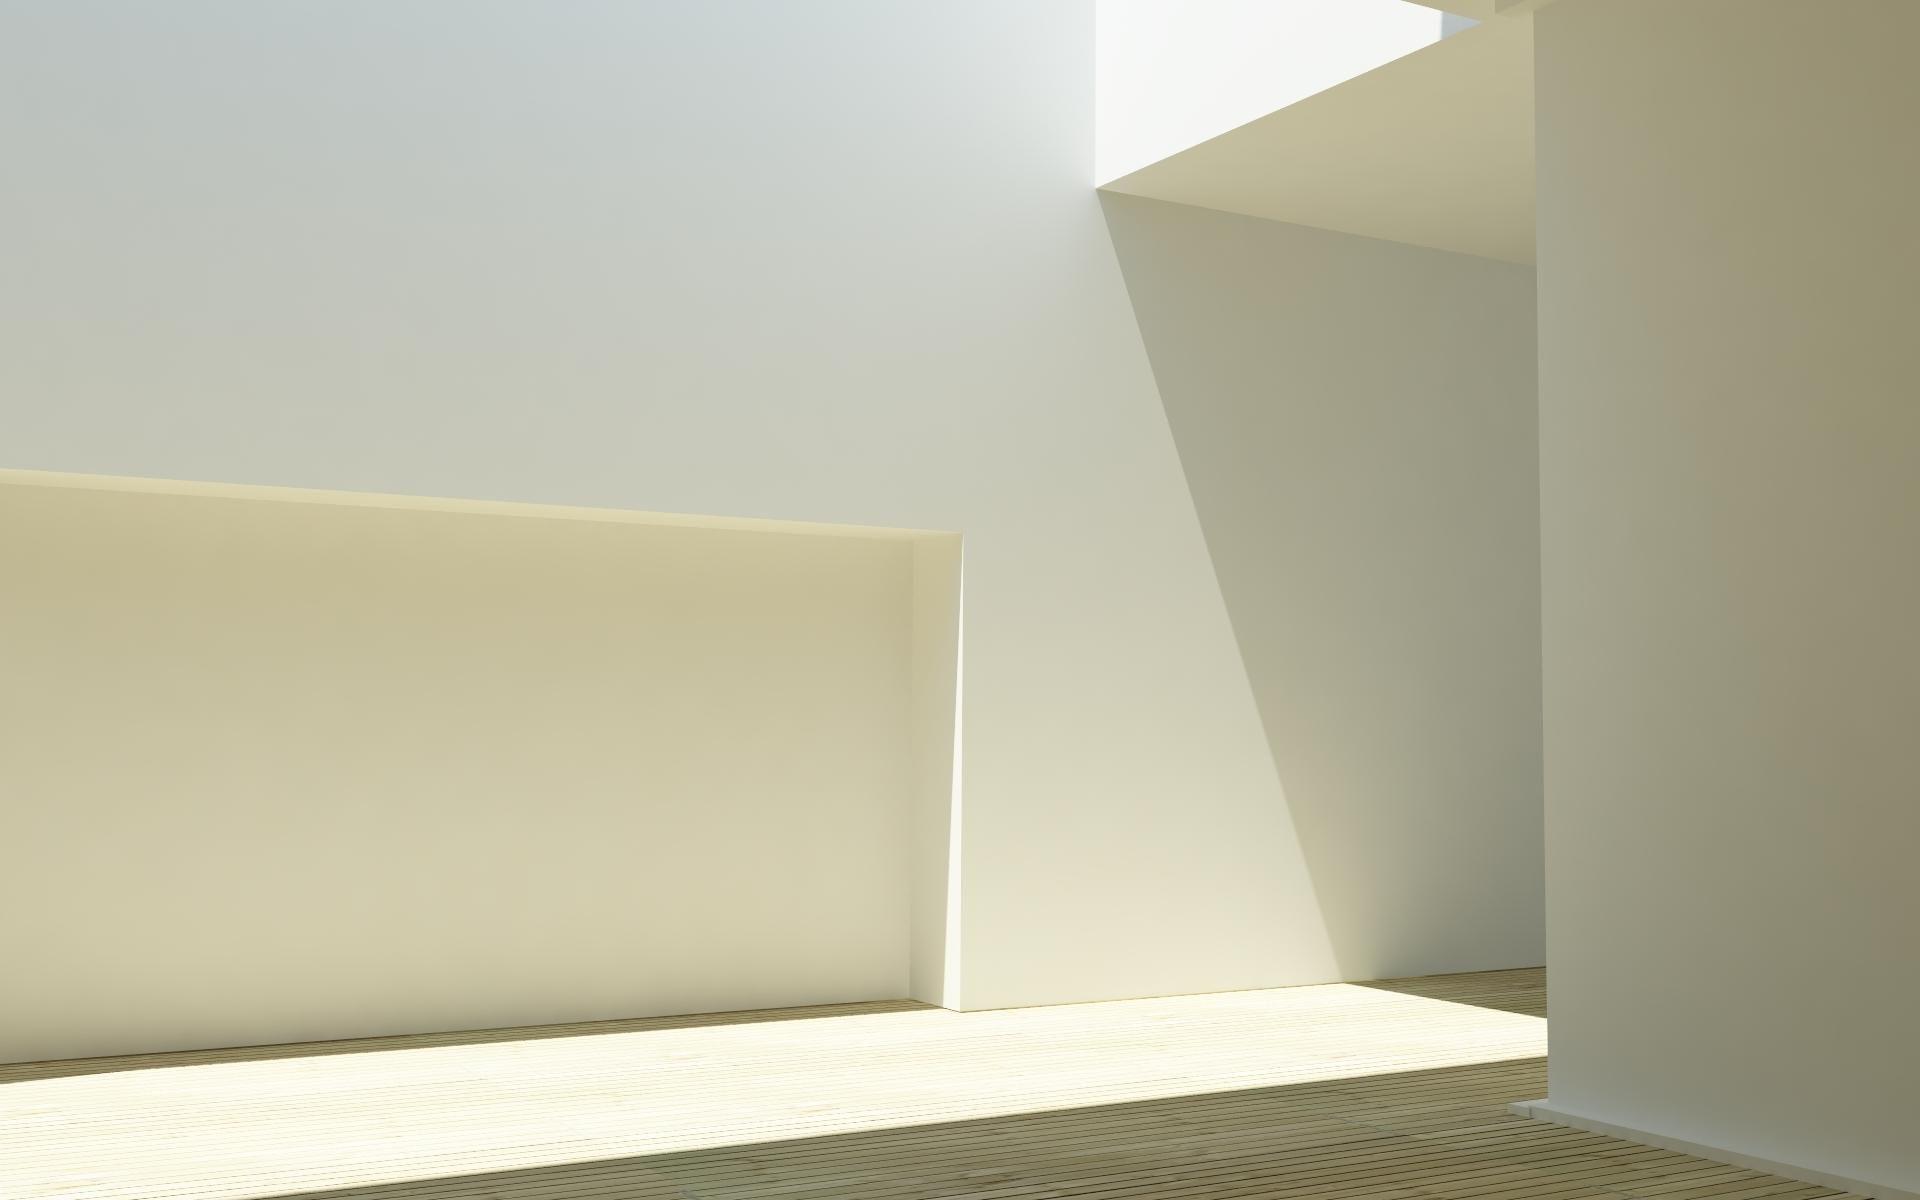 applife-wallpaper-minimalism39